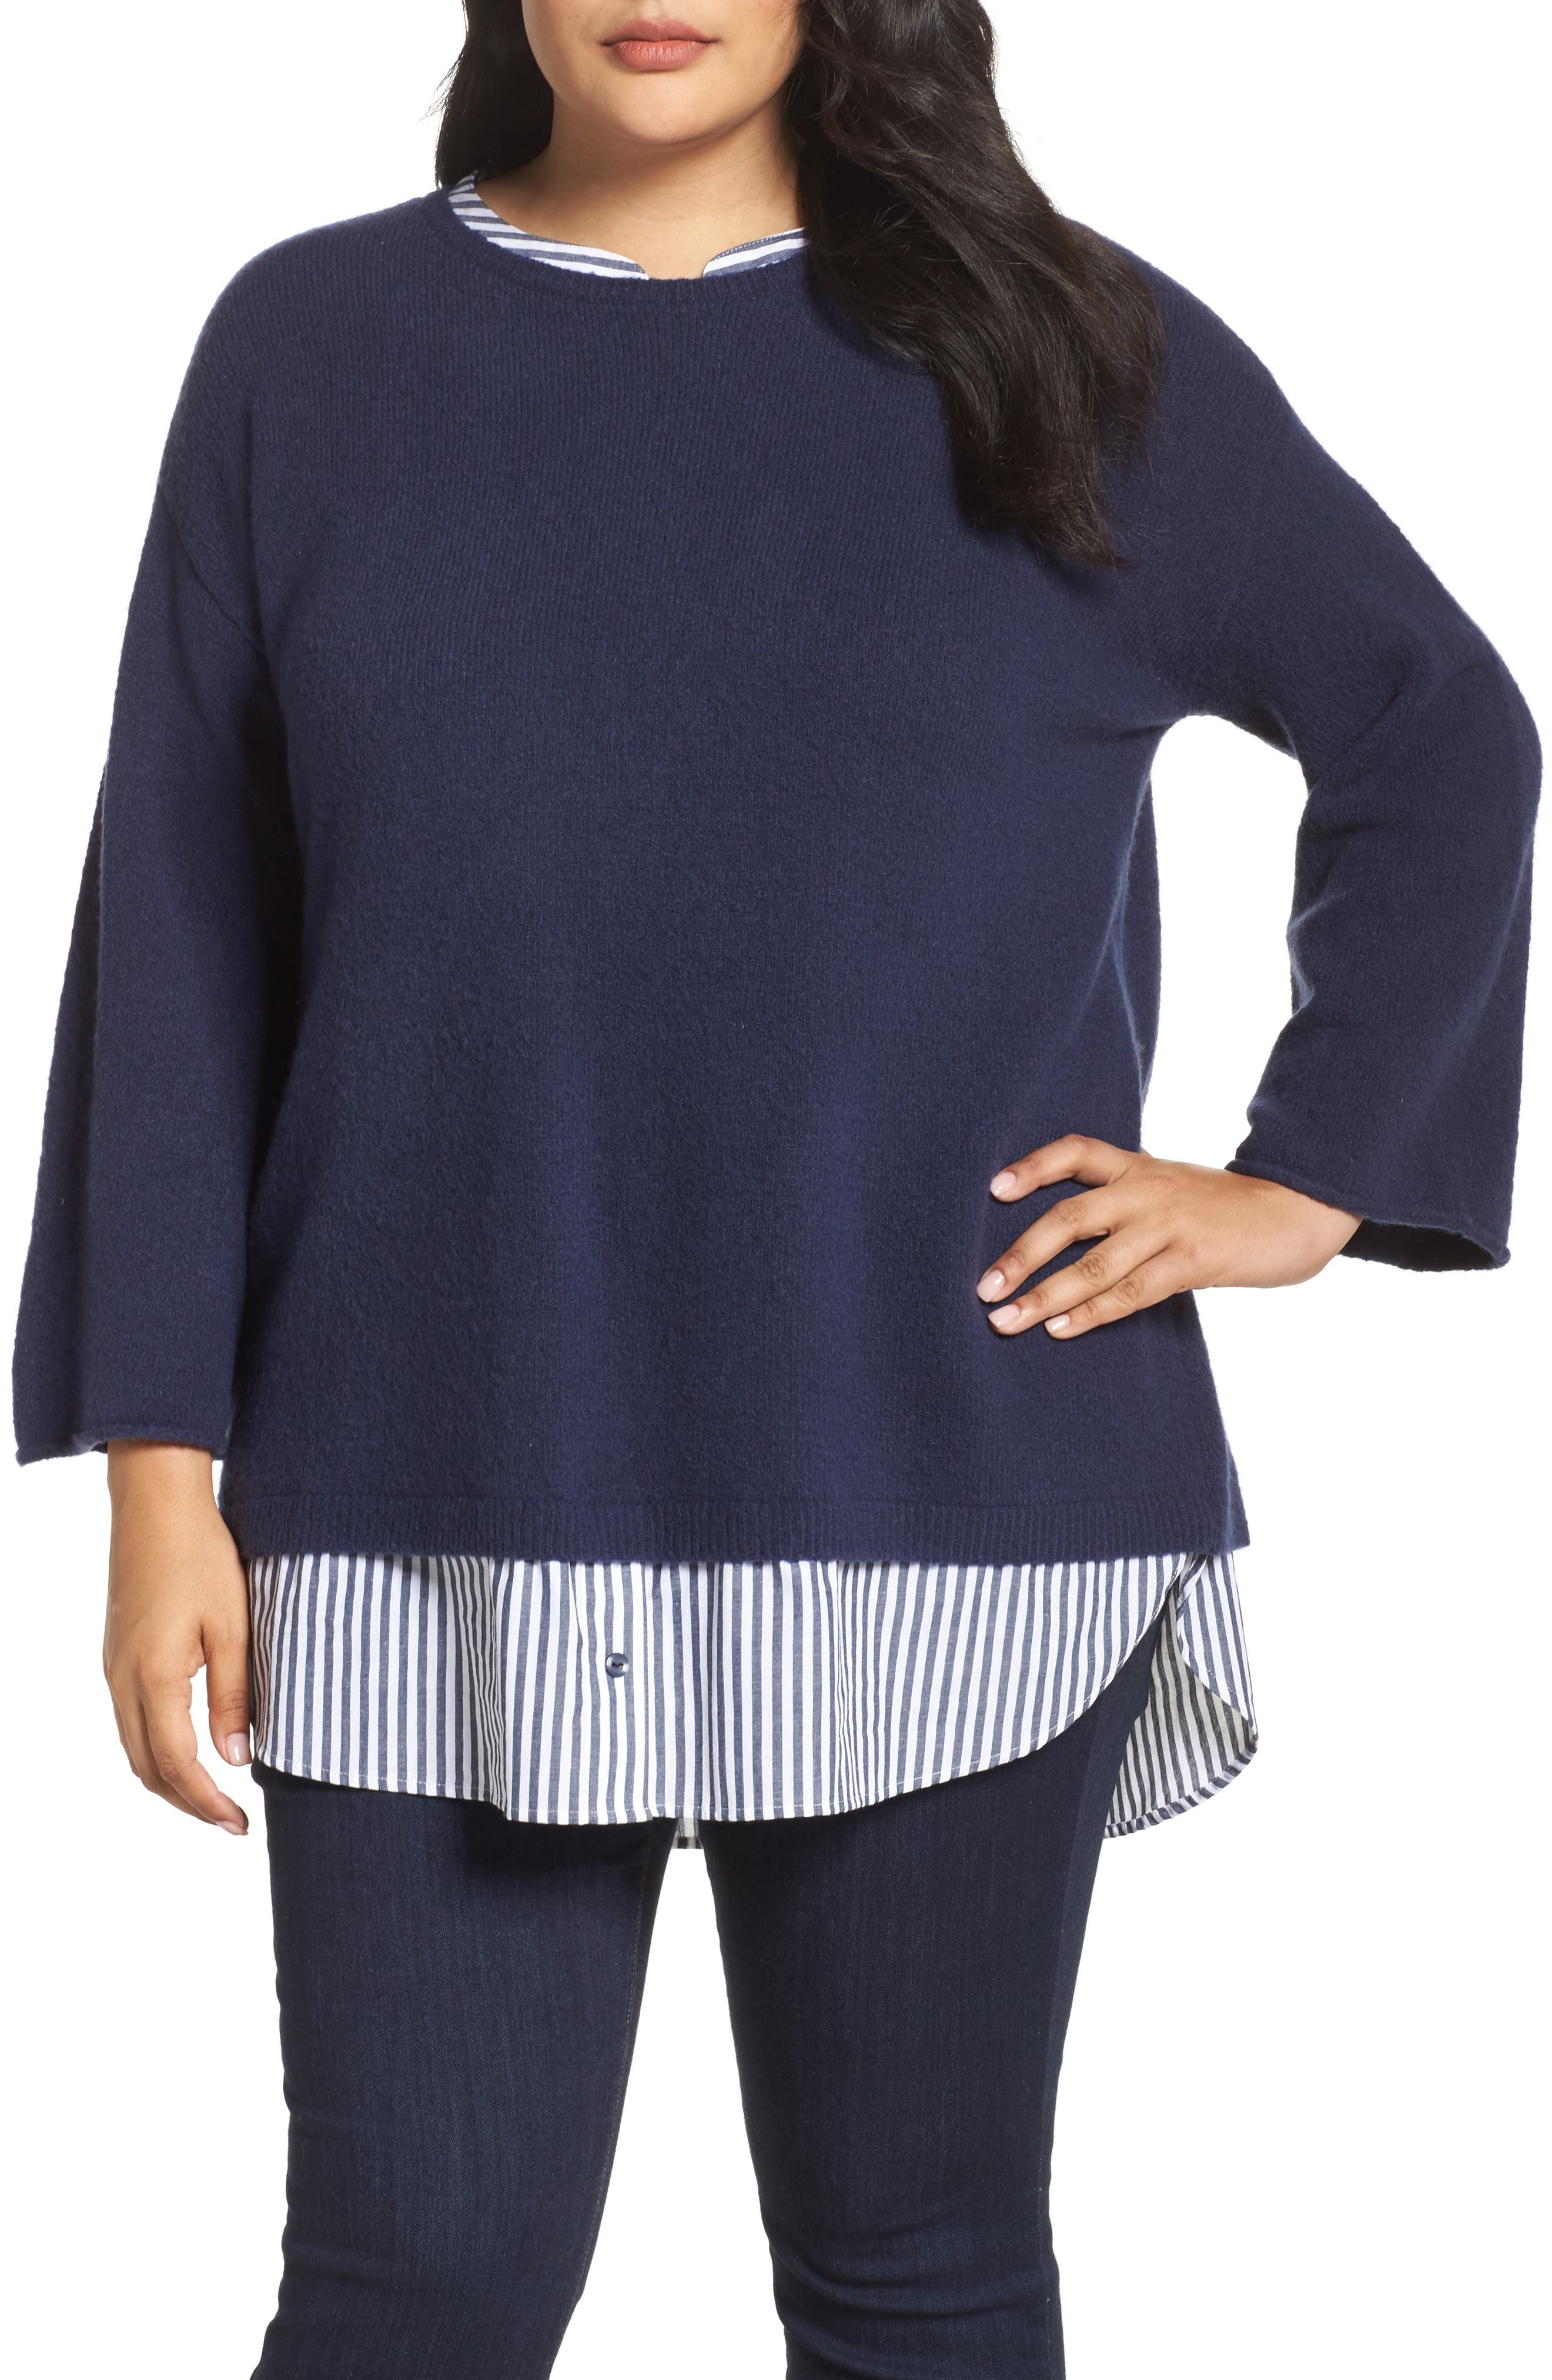 Cozy Layered Sweater,                             Main thumbnail 1, color,                             Navy Peacoat